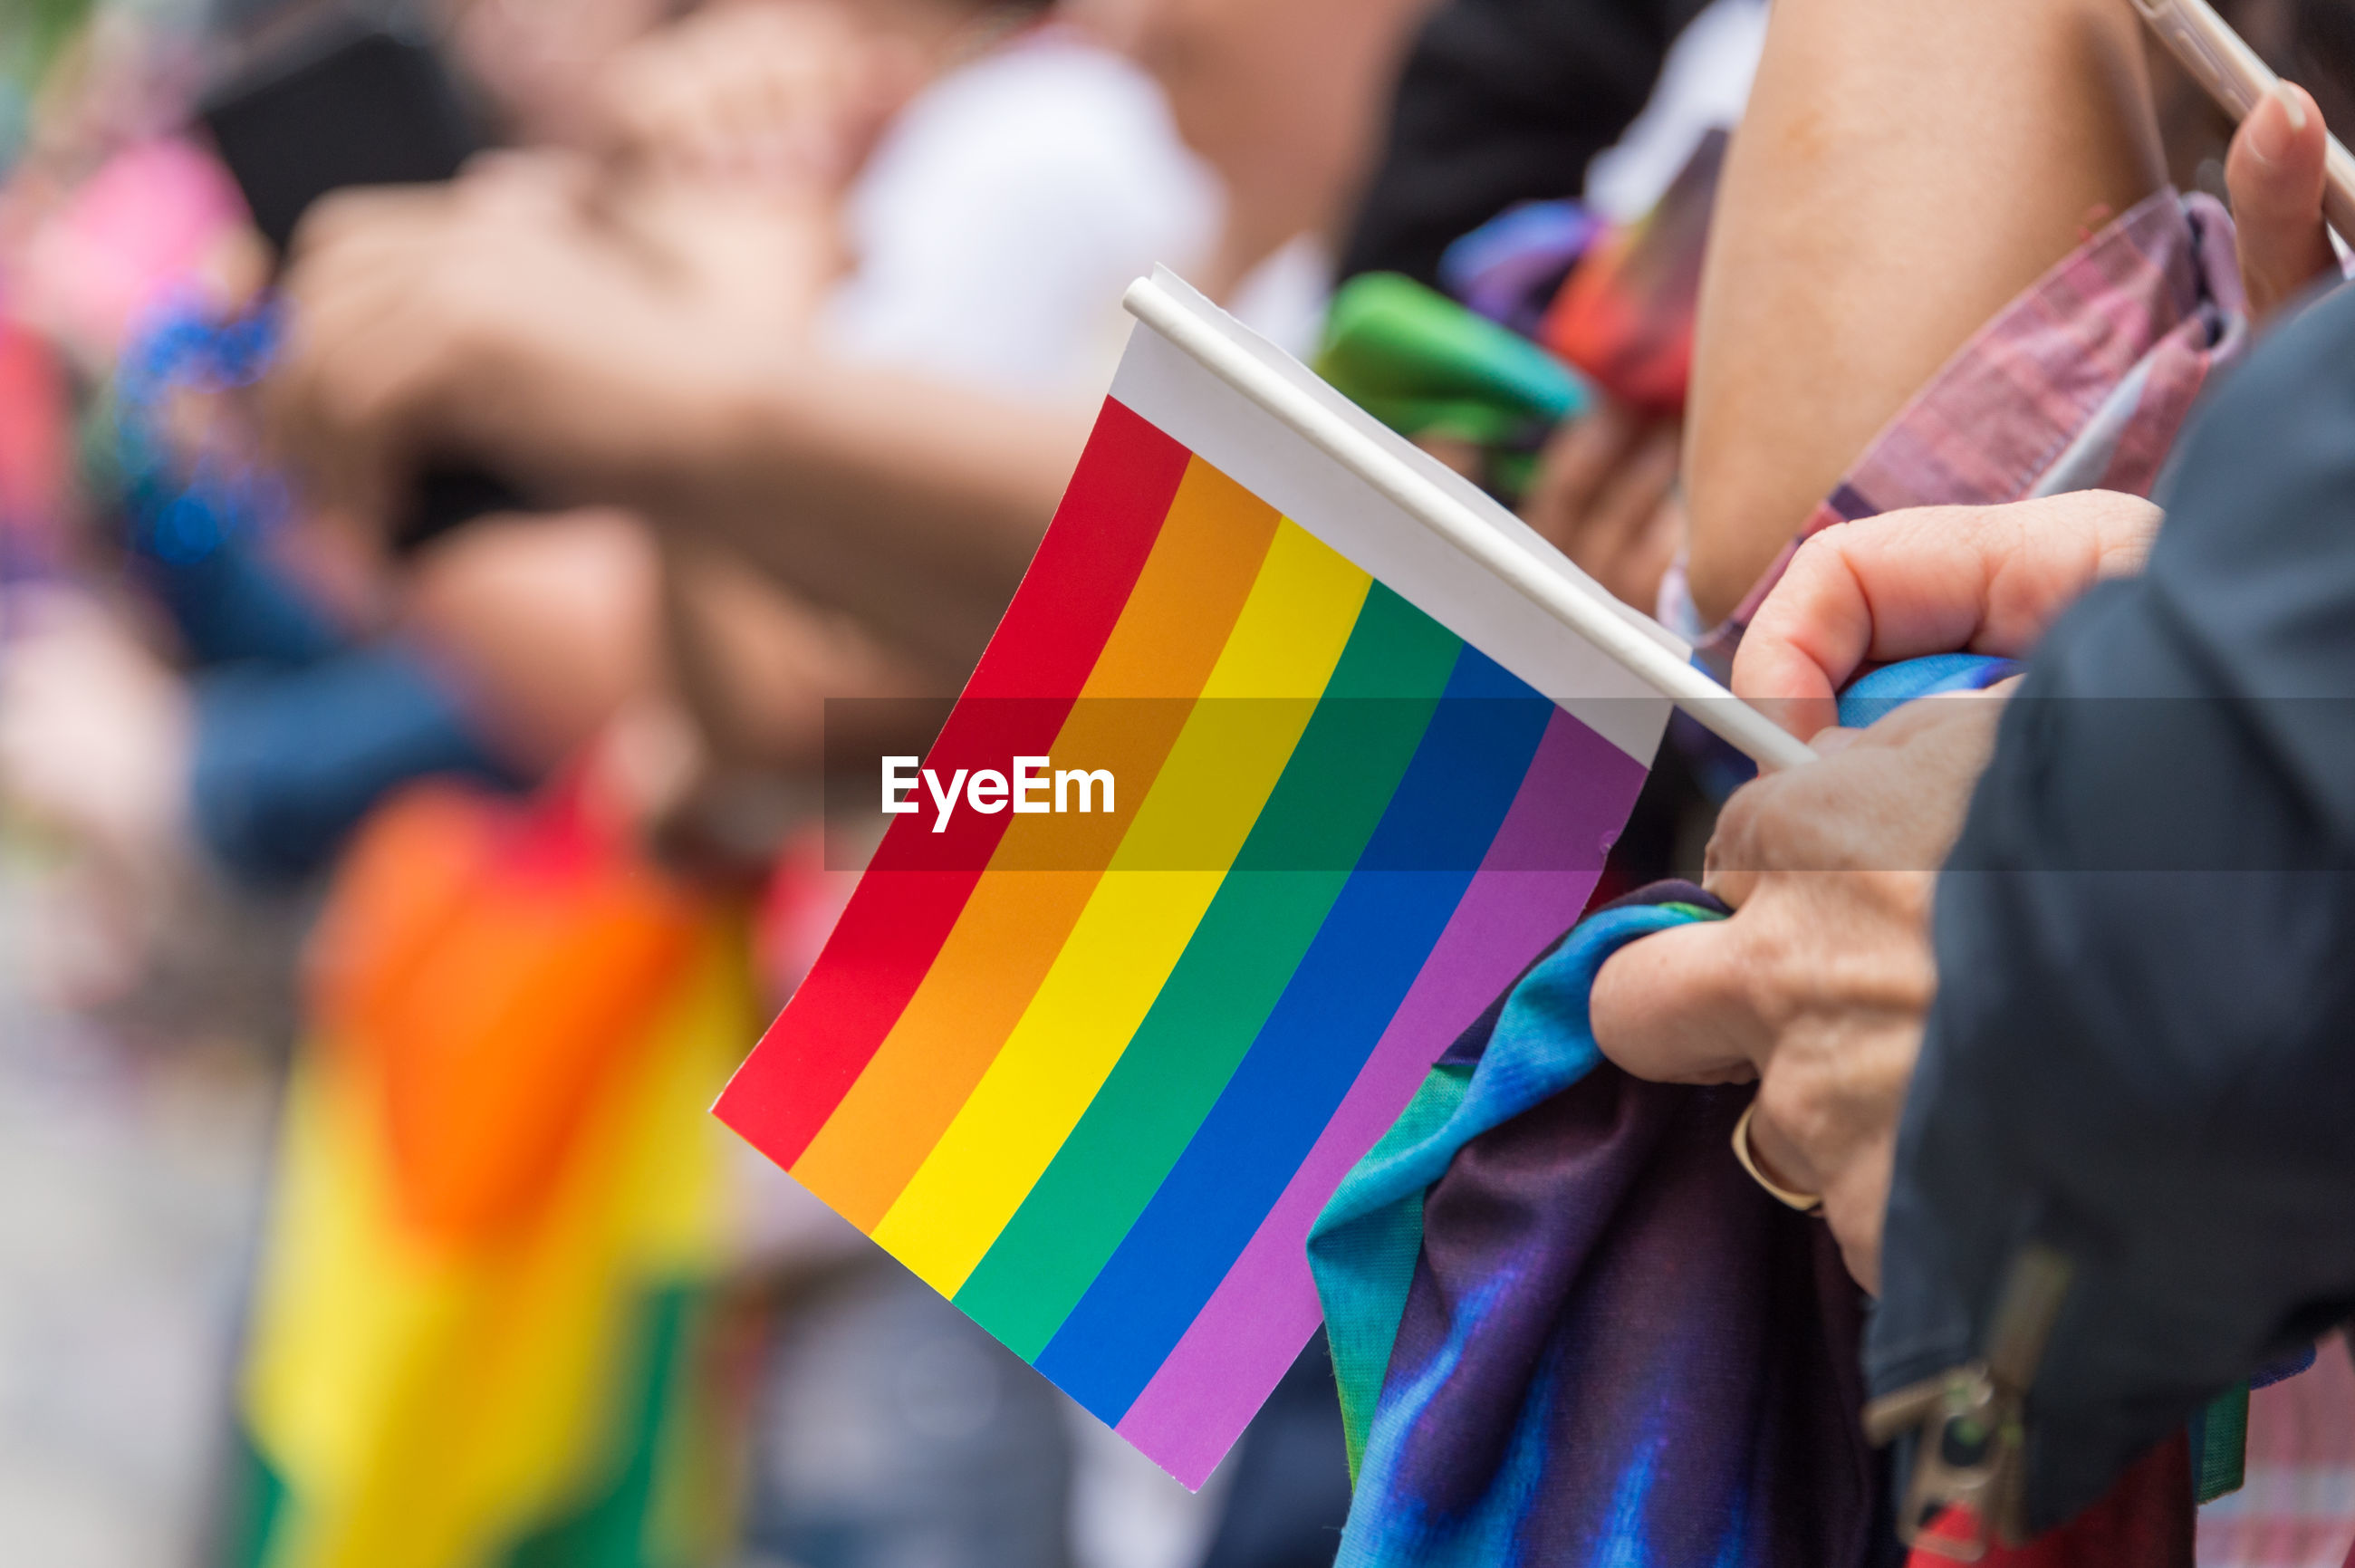 Close-up of hand holding rainbow flag